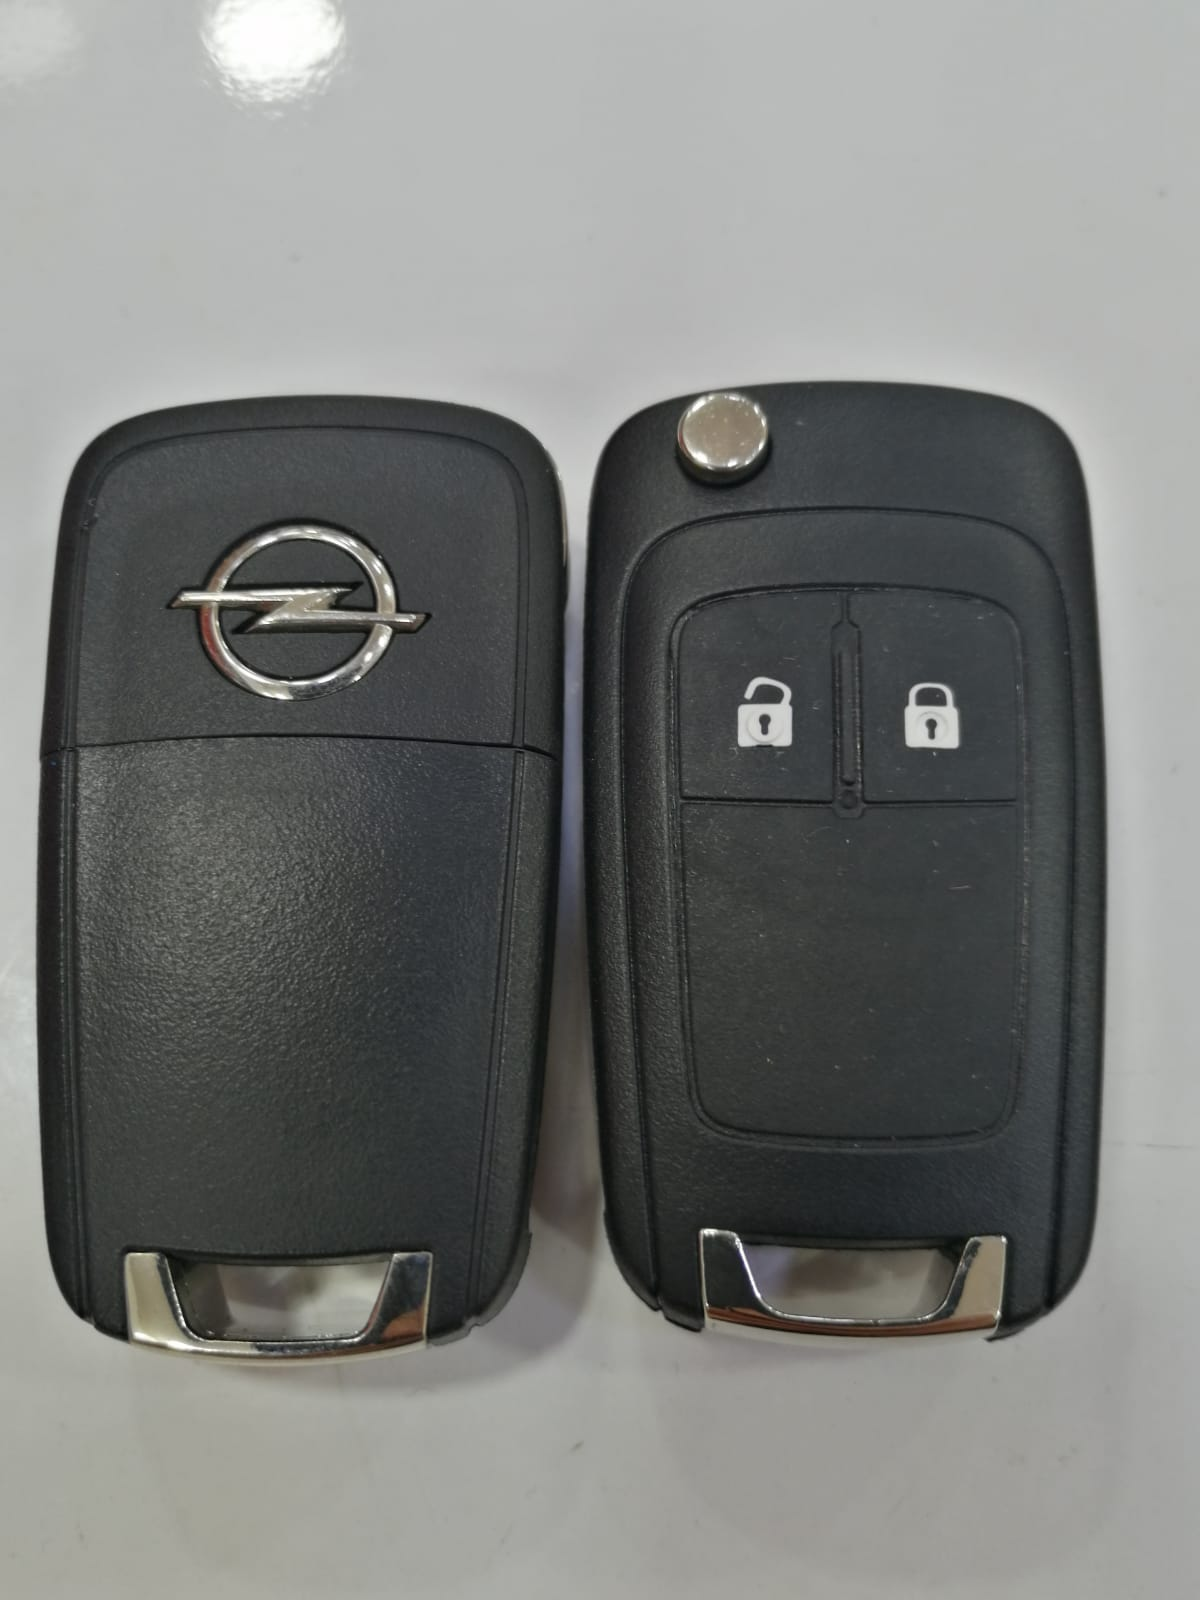 Astra J - insignia 2 buton